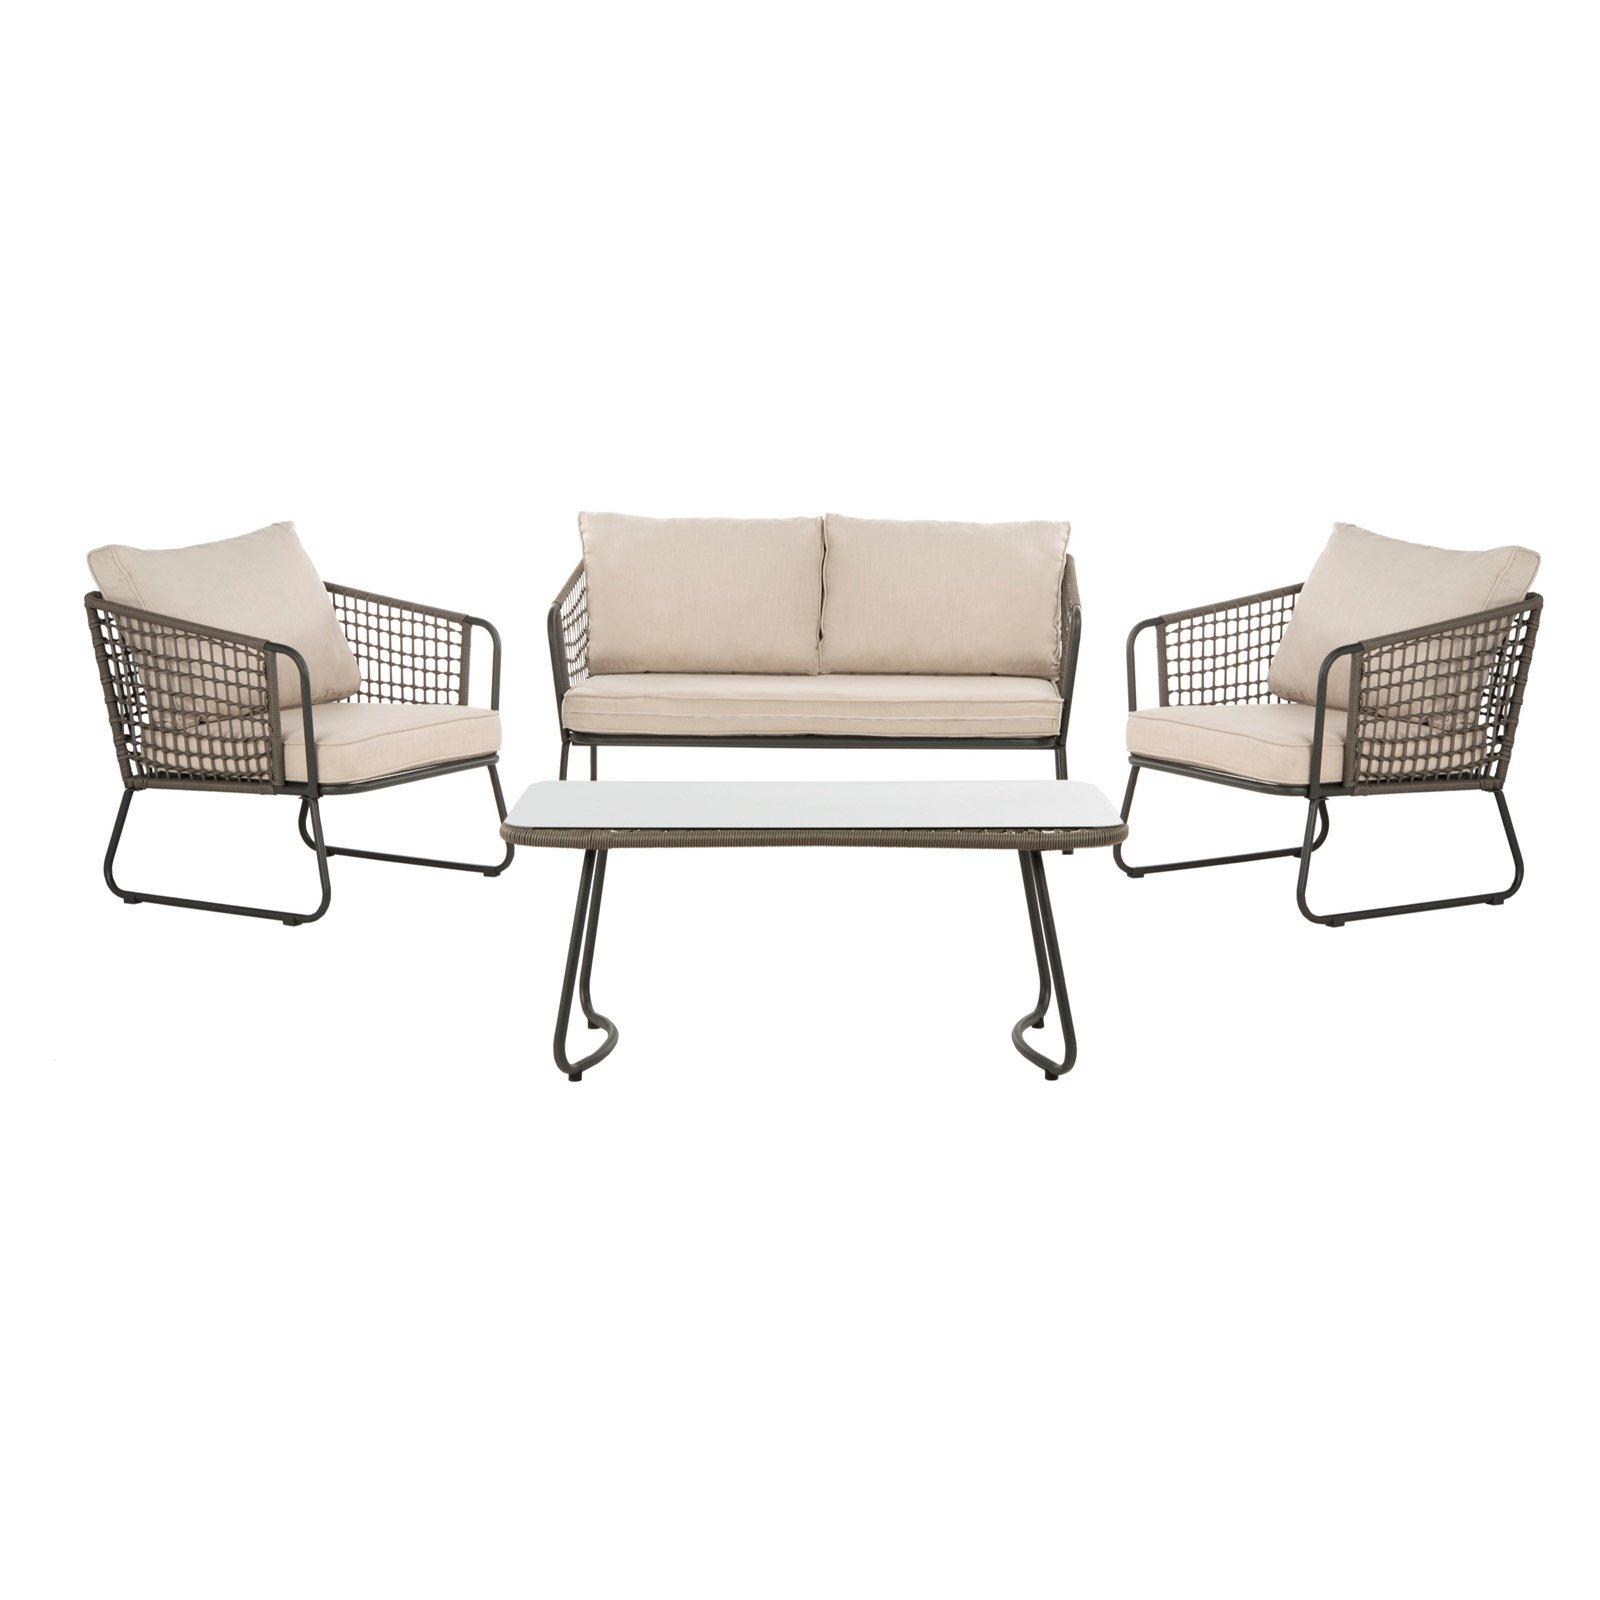 outdoor safavieh benjin wicker 4 piece patio conversation set in rh pinterest com